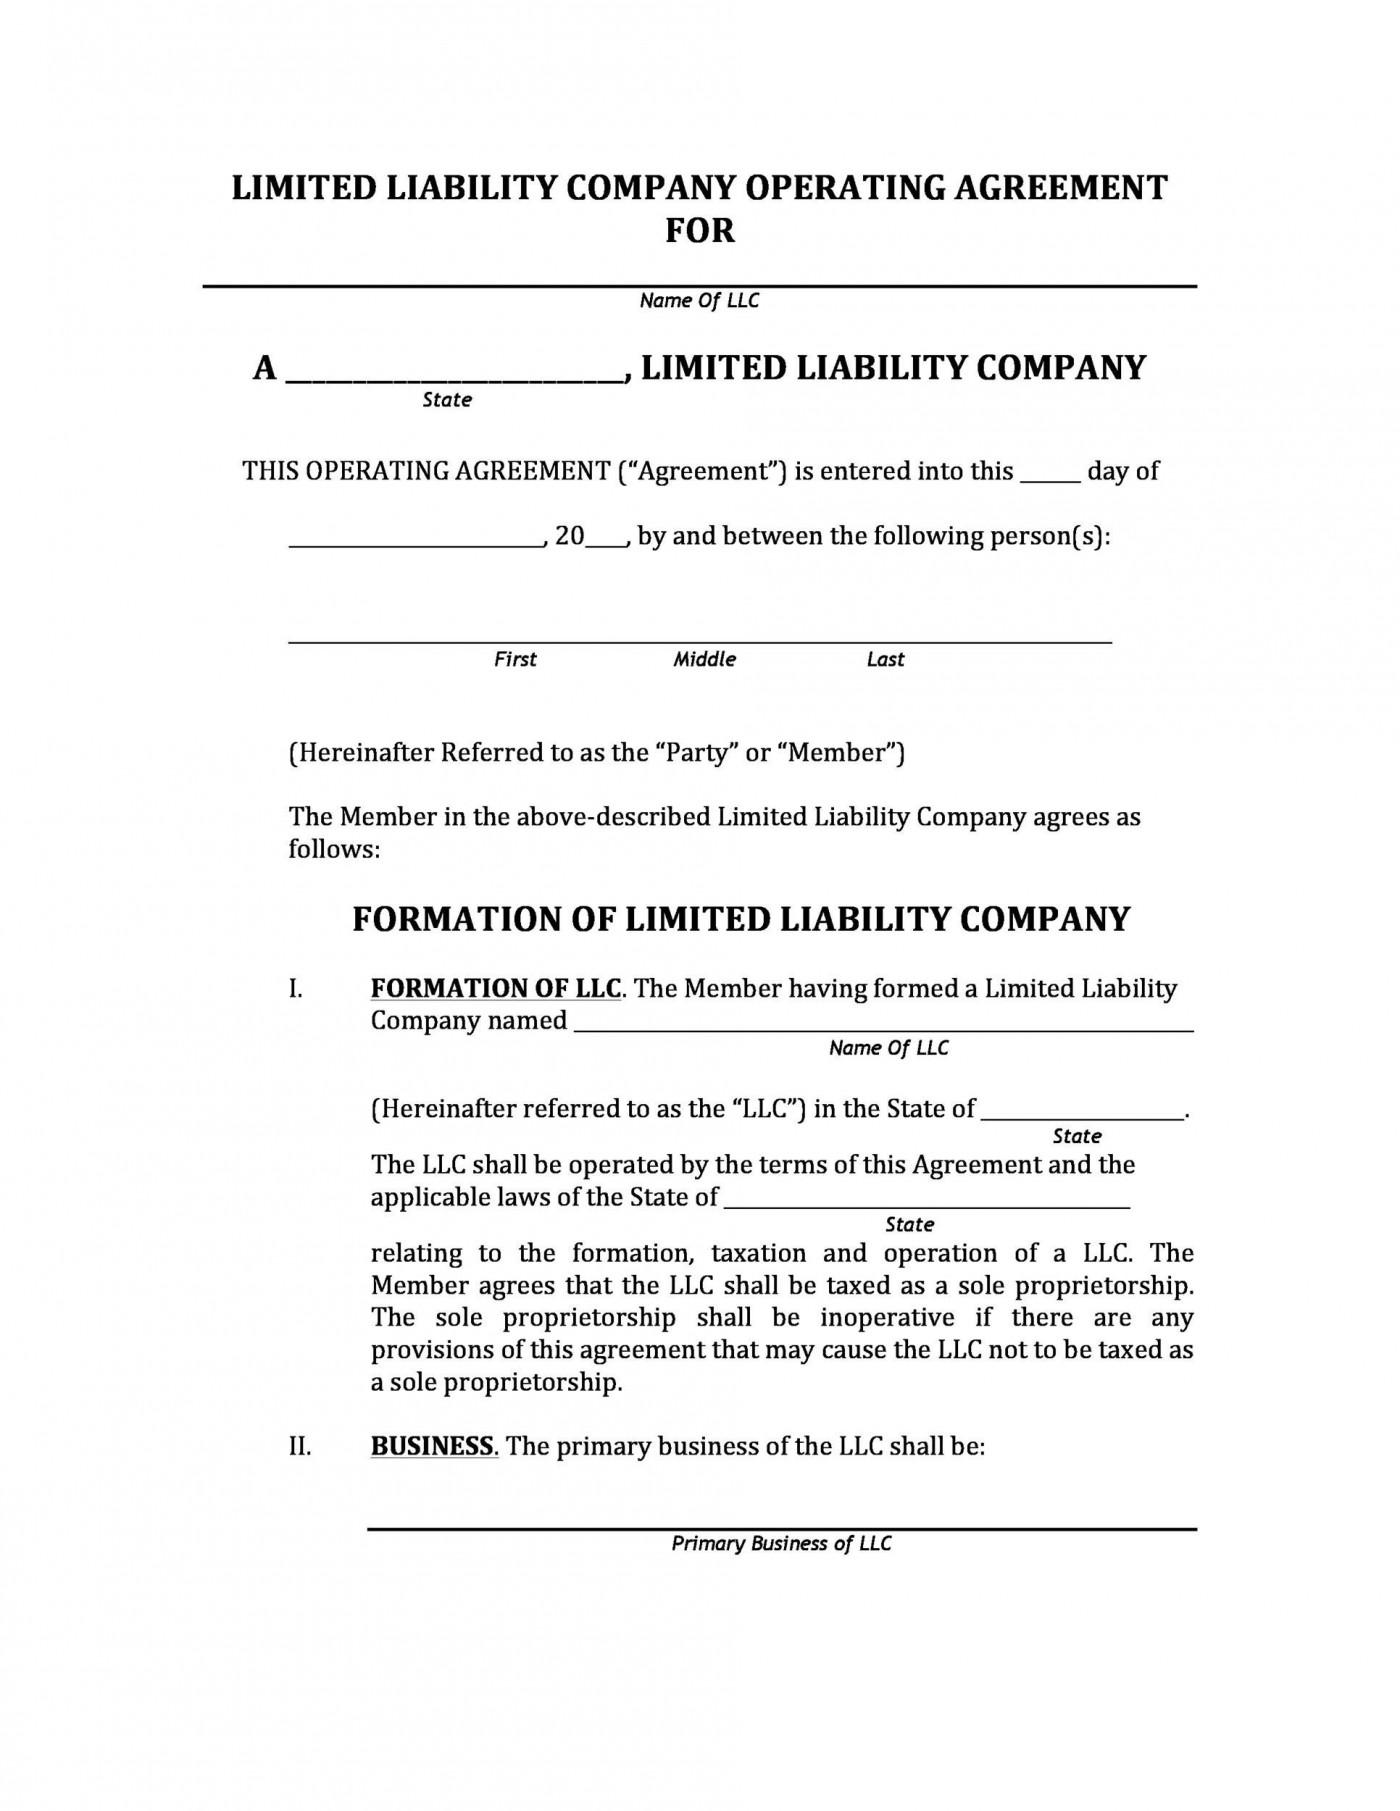 006 Marvelou Llc Partnership Agreement Template Image  Free Operating1400